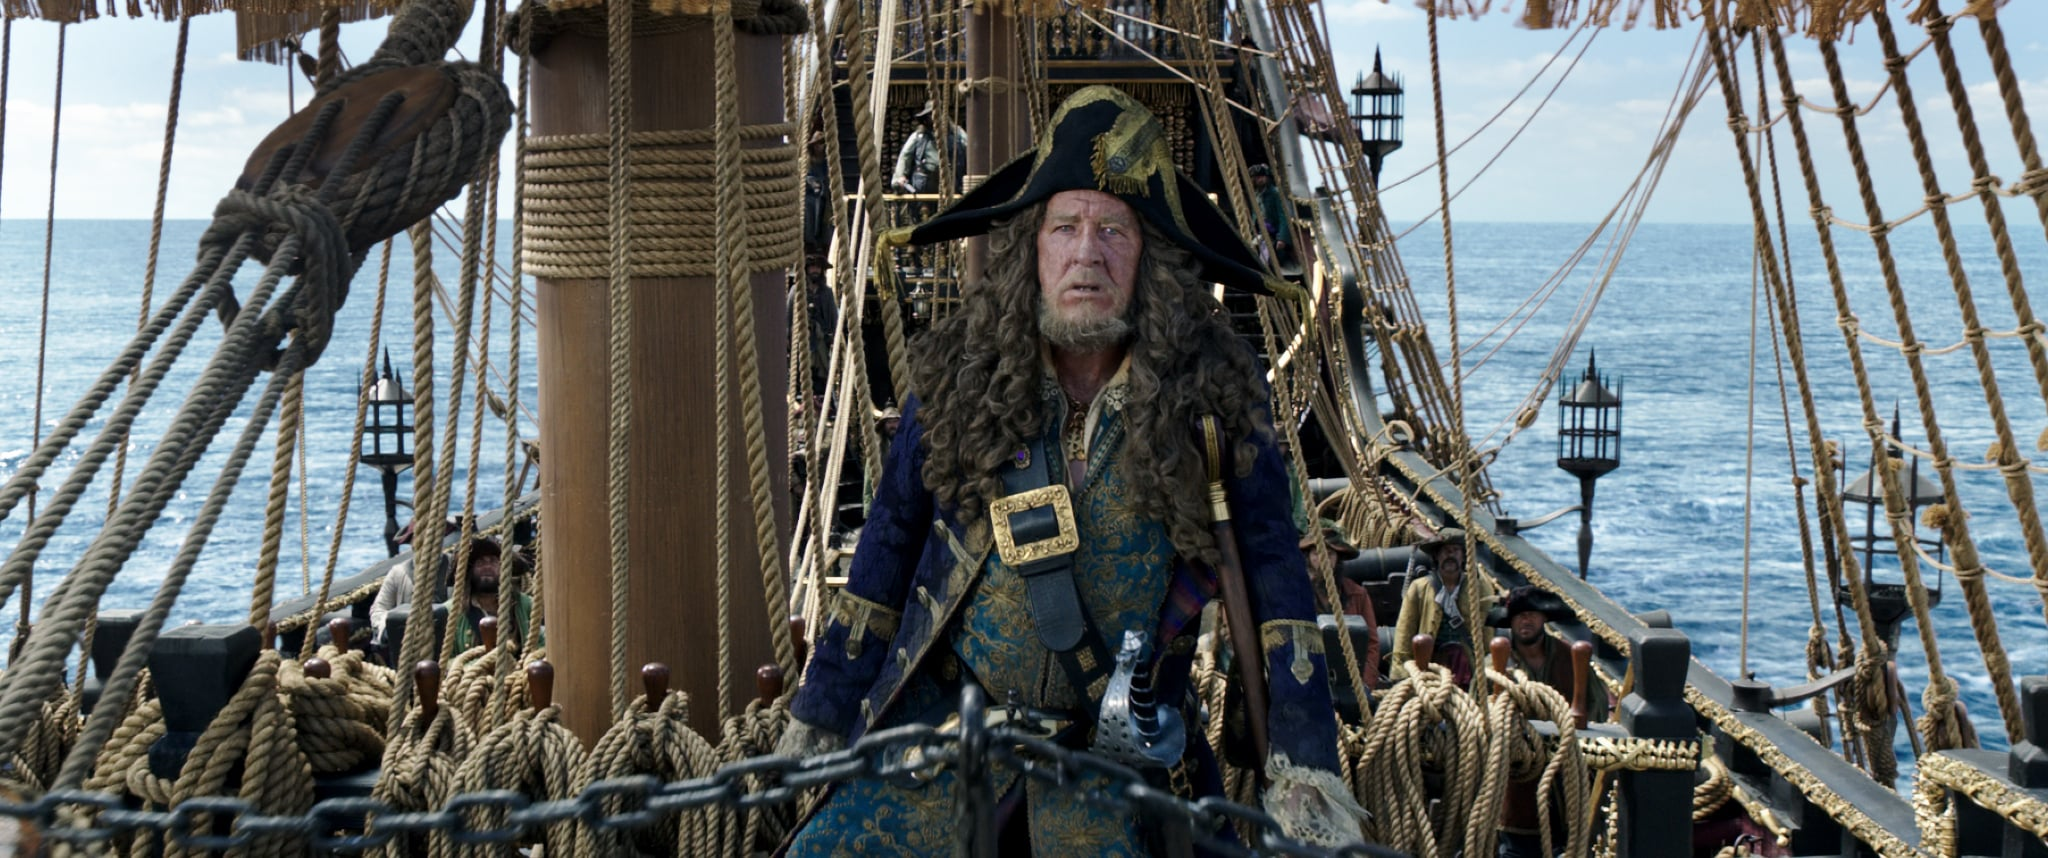 PIRATES OF THE CARIBBEAN: DEAD MEN TELL NO TALES - Extended Look! #APiratesDeathForMe #PiratesOfTheCaribbean